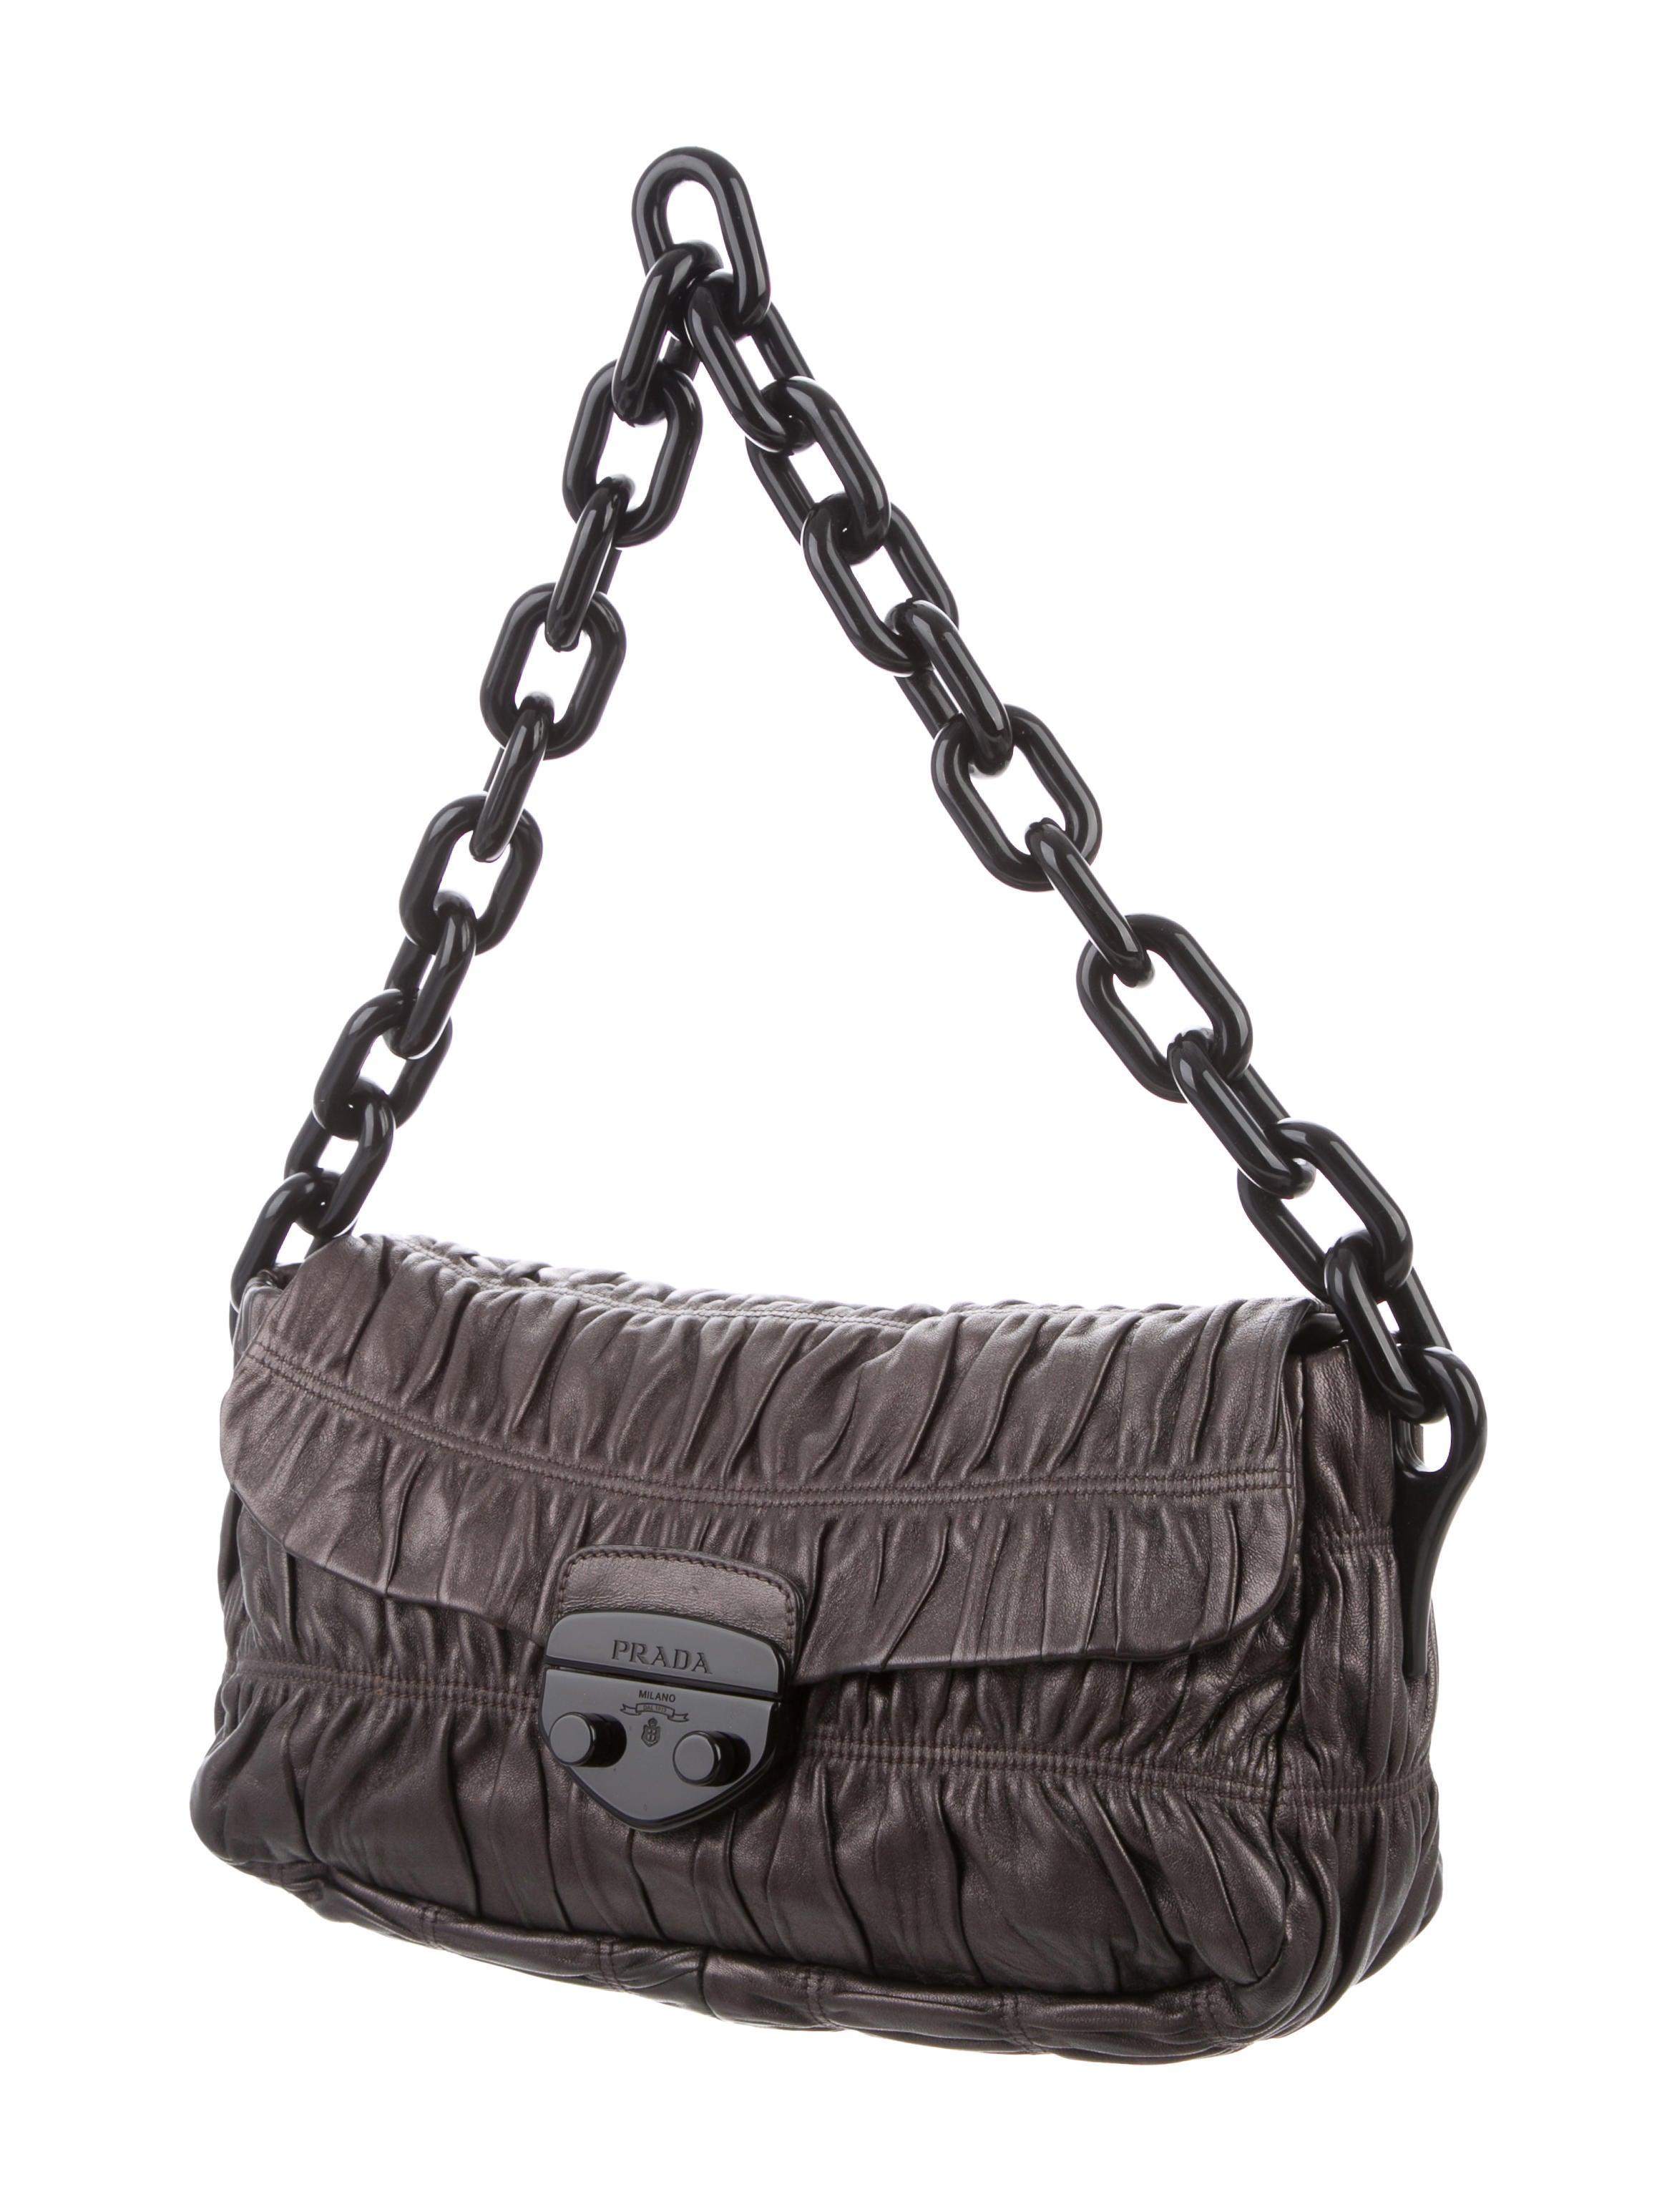 Prada Nappa Gaufre Shoulder Bag - Handbags - PRA201665   The RealReal 7d6bcc82e6